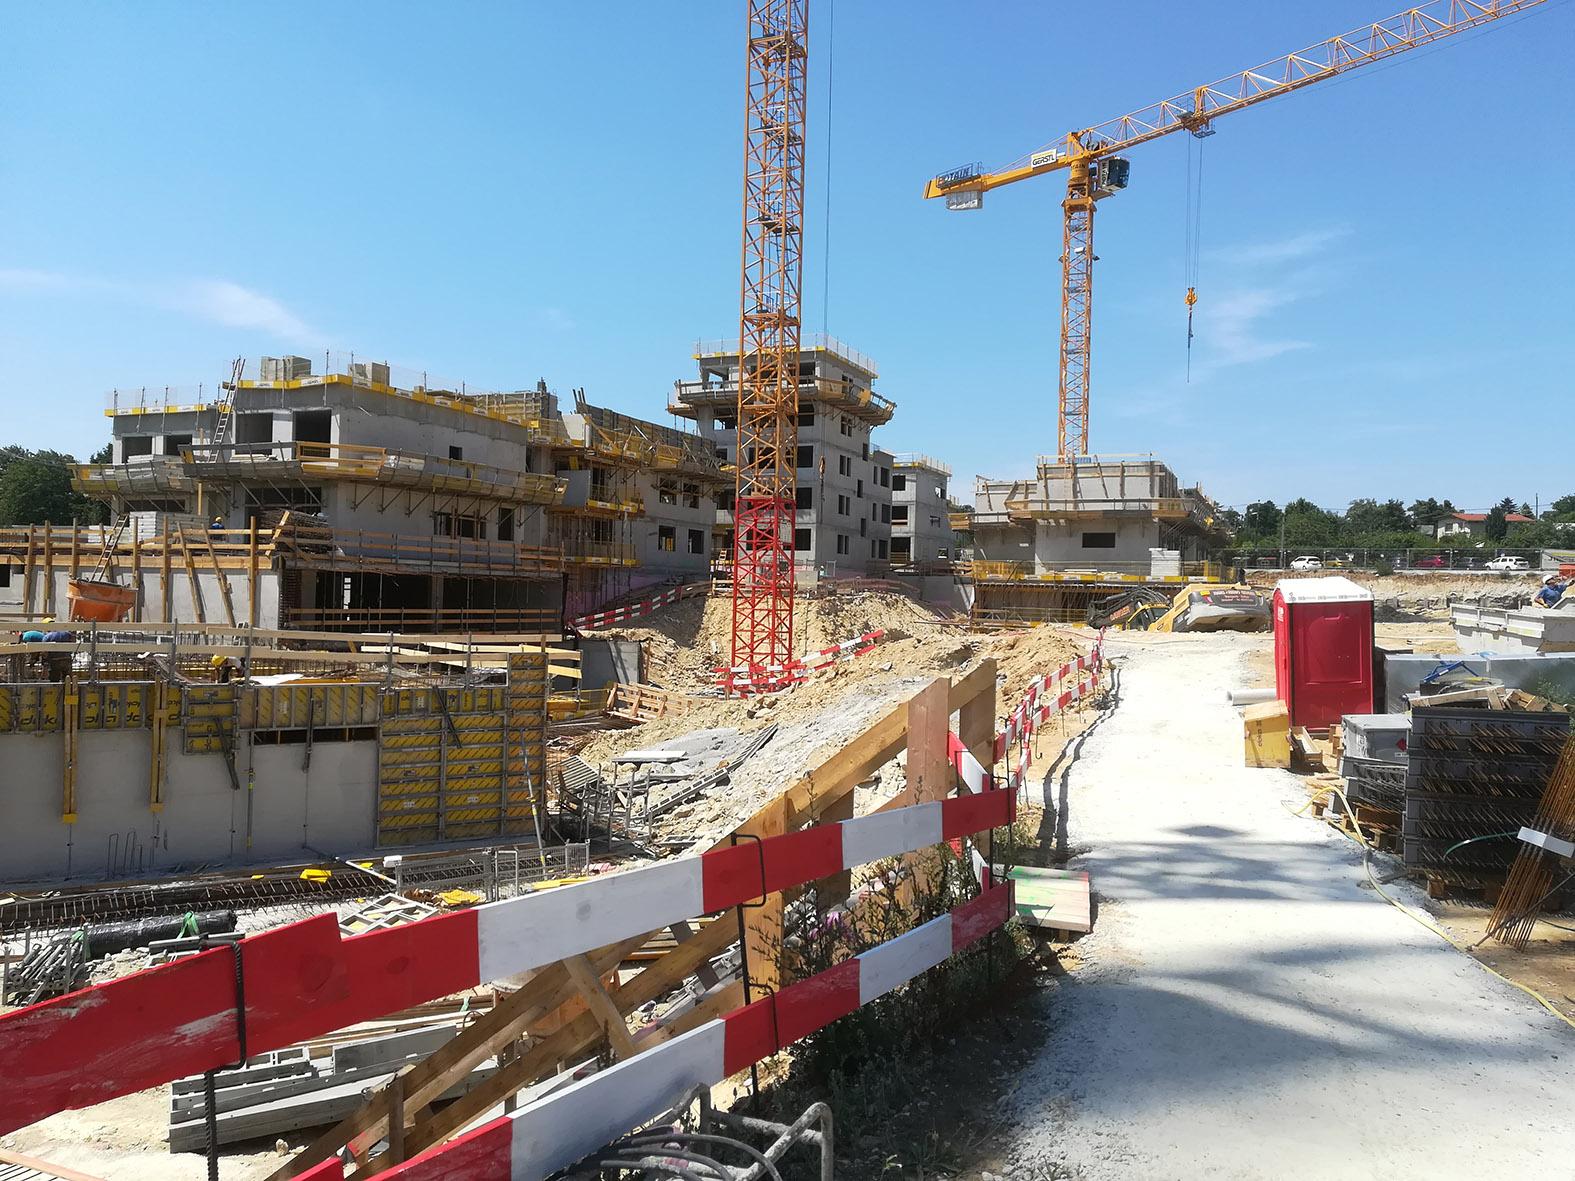 Baustelle_Juli19